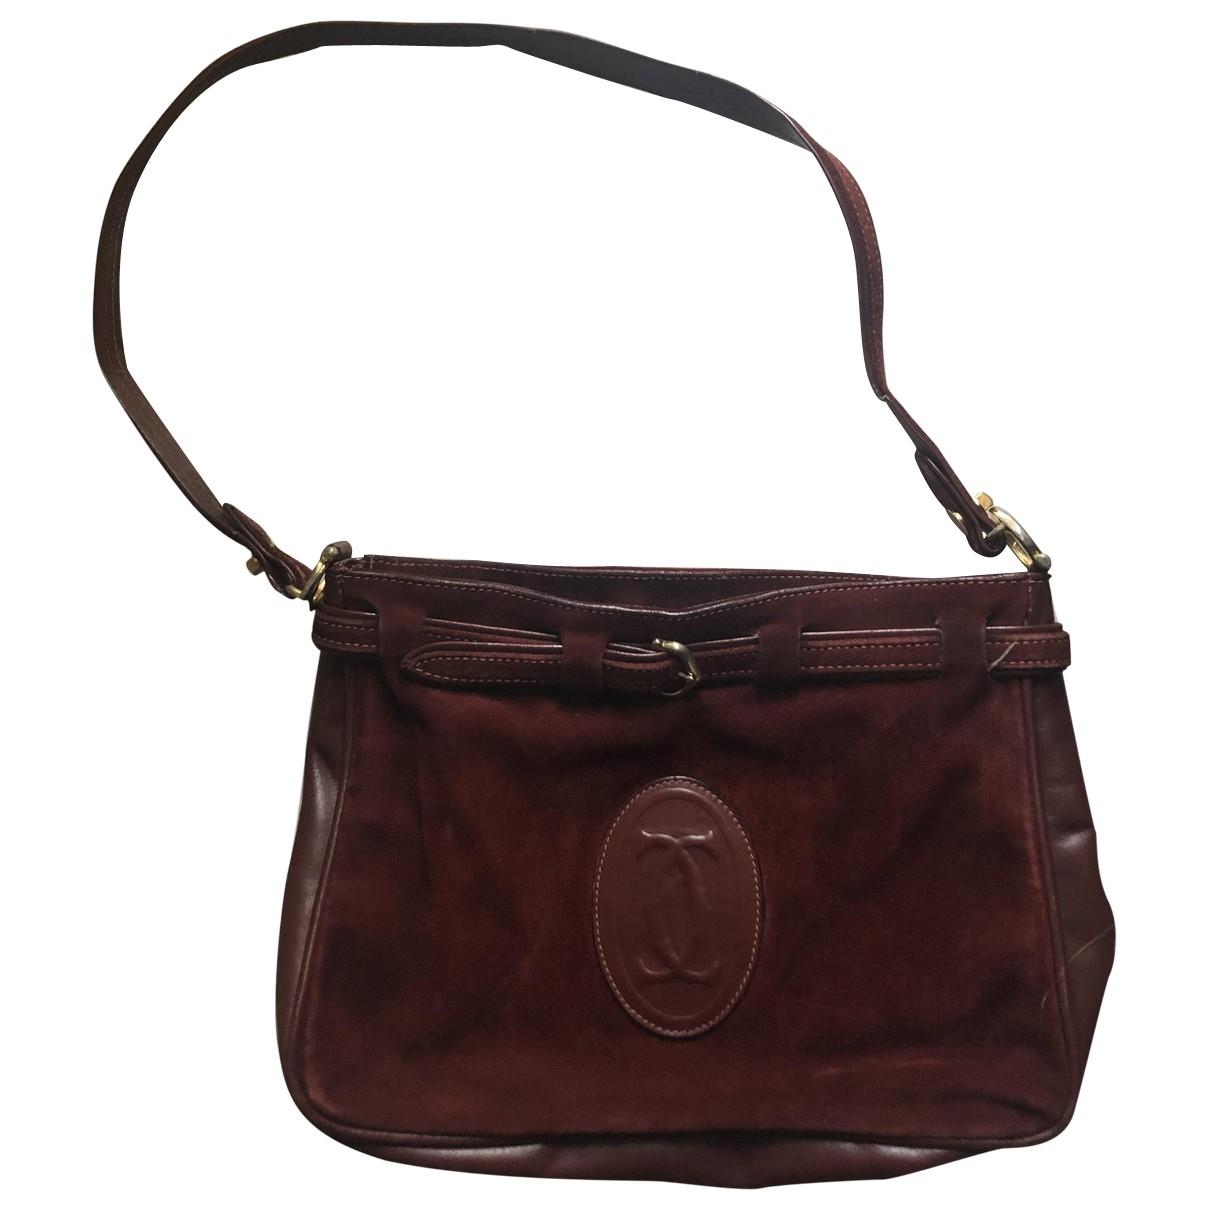 Cartier \N Burgundy Suede handbag for Women \N